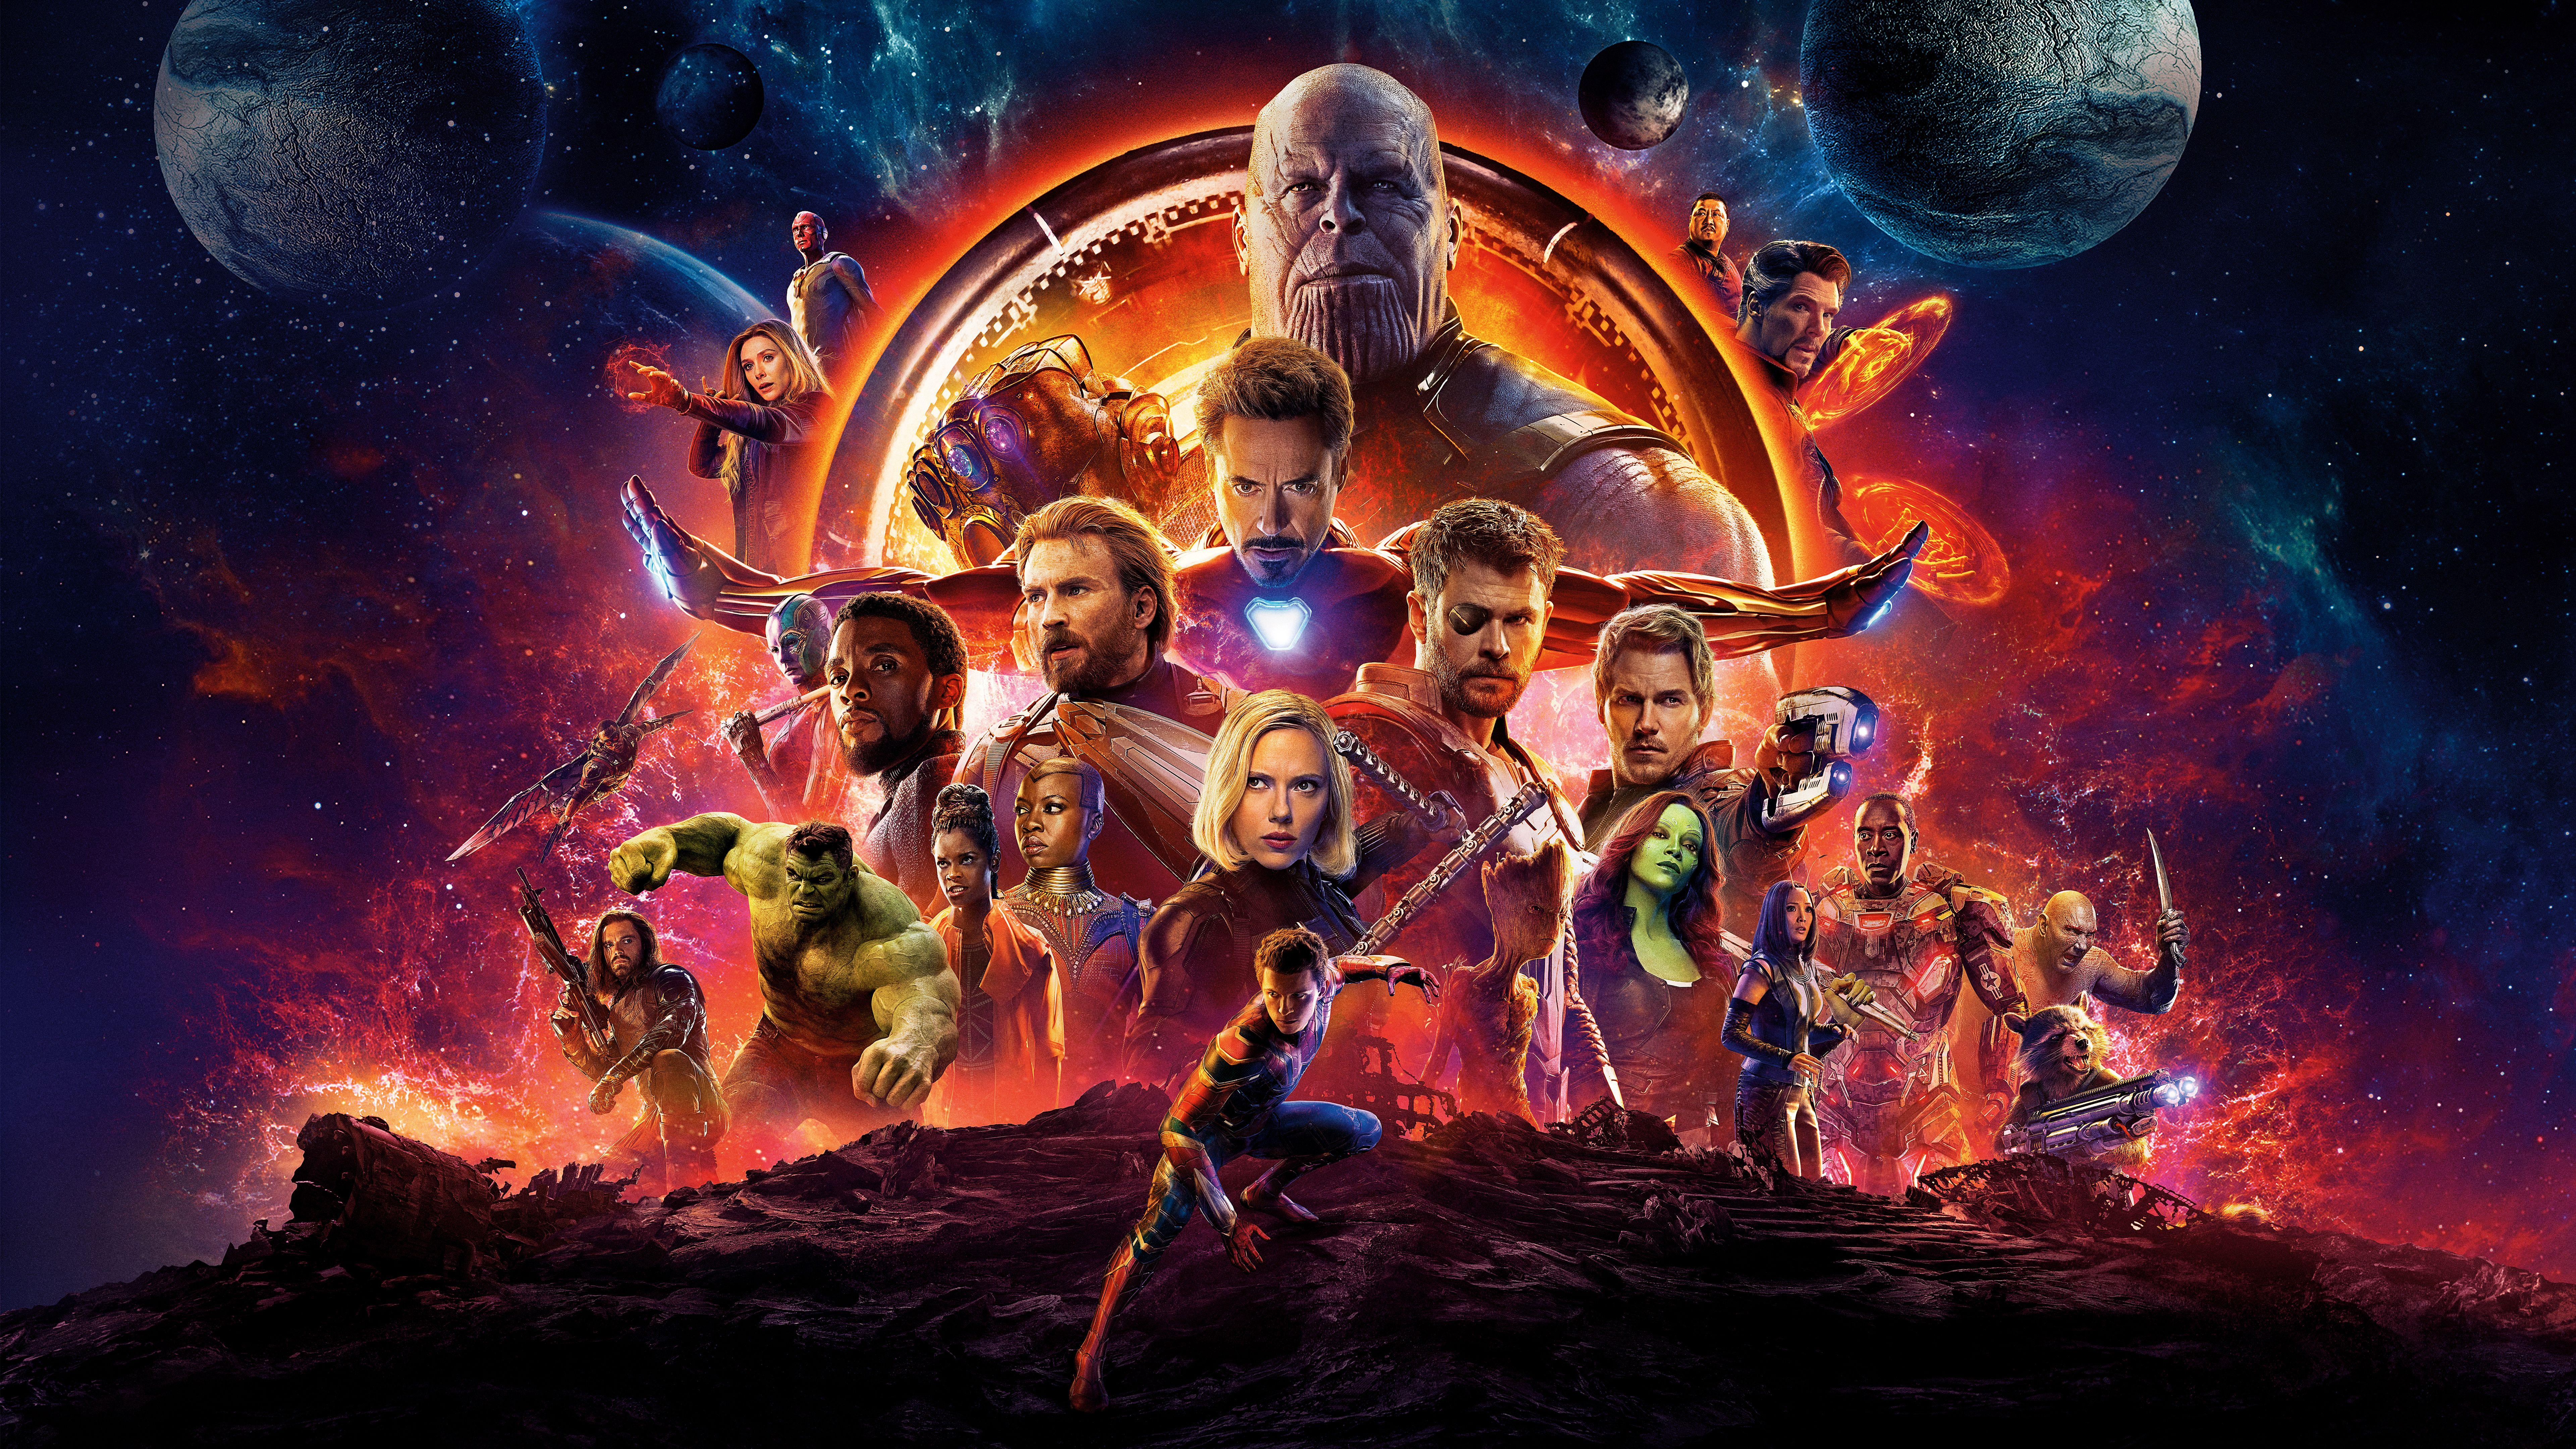 Infinity War Poster Wallpapers Wallpaper Cave